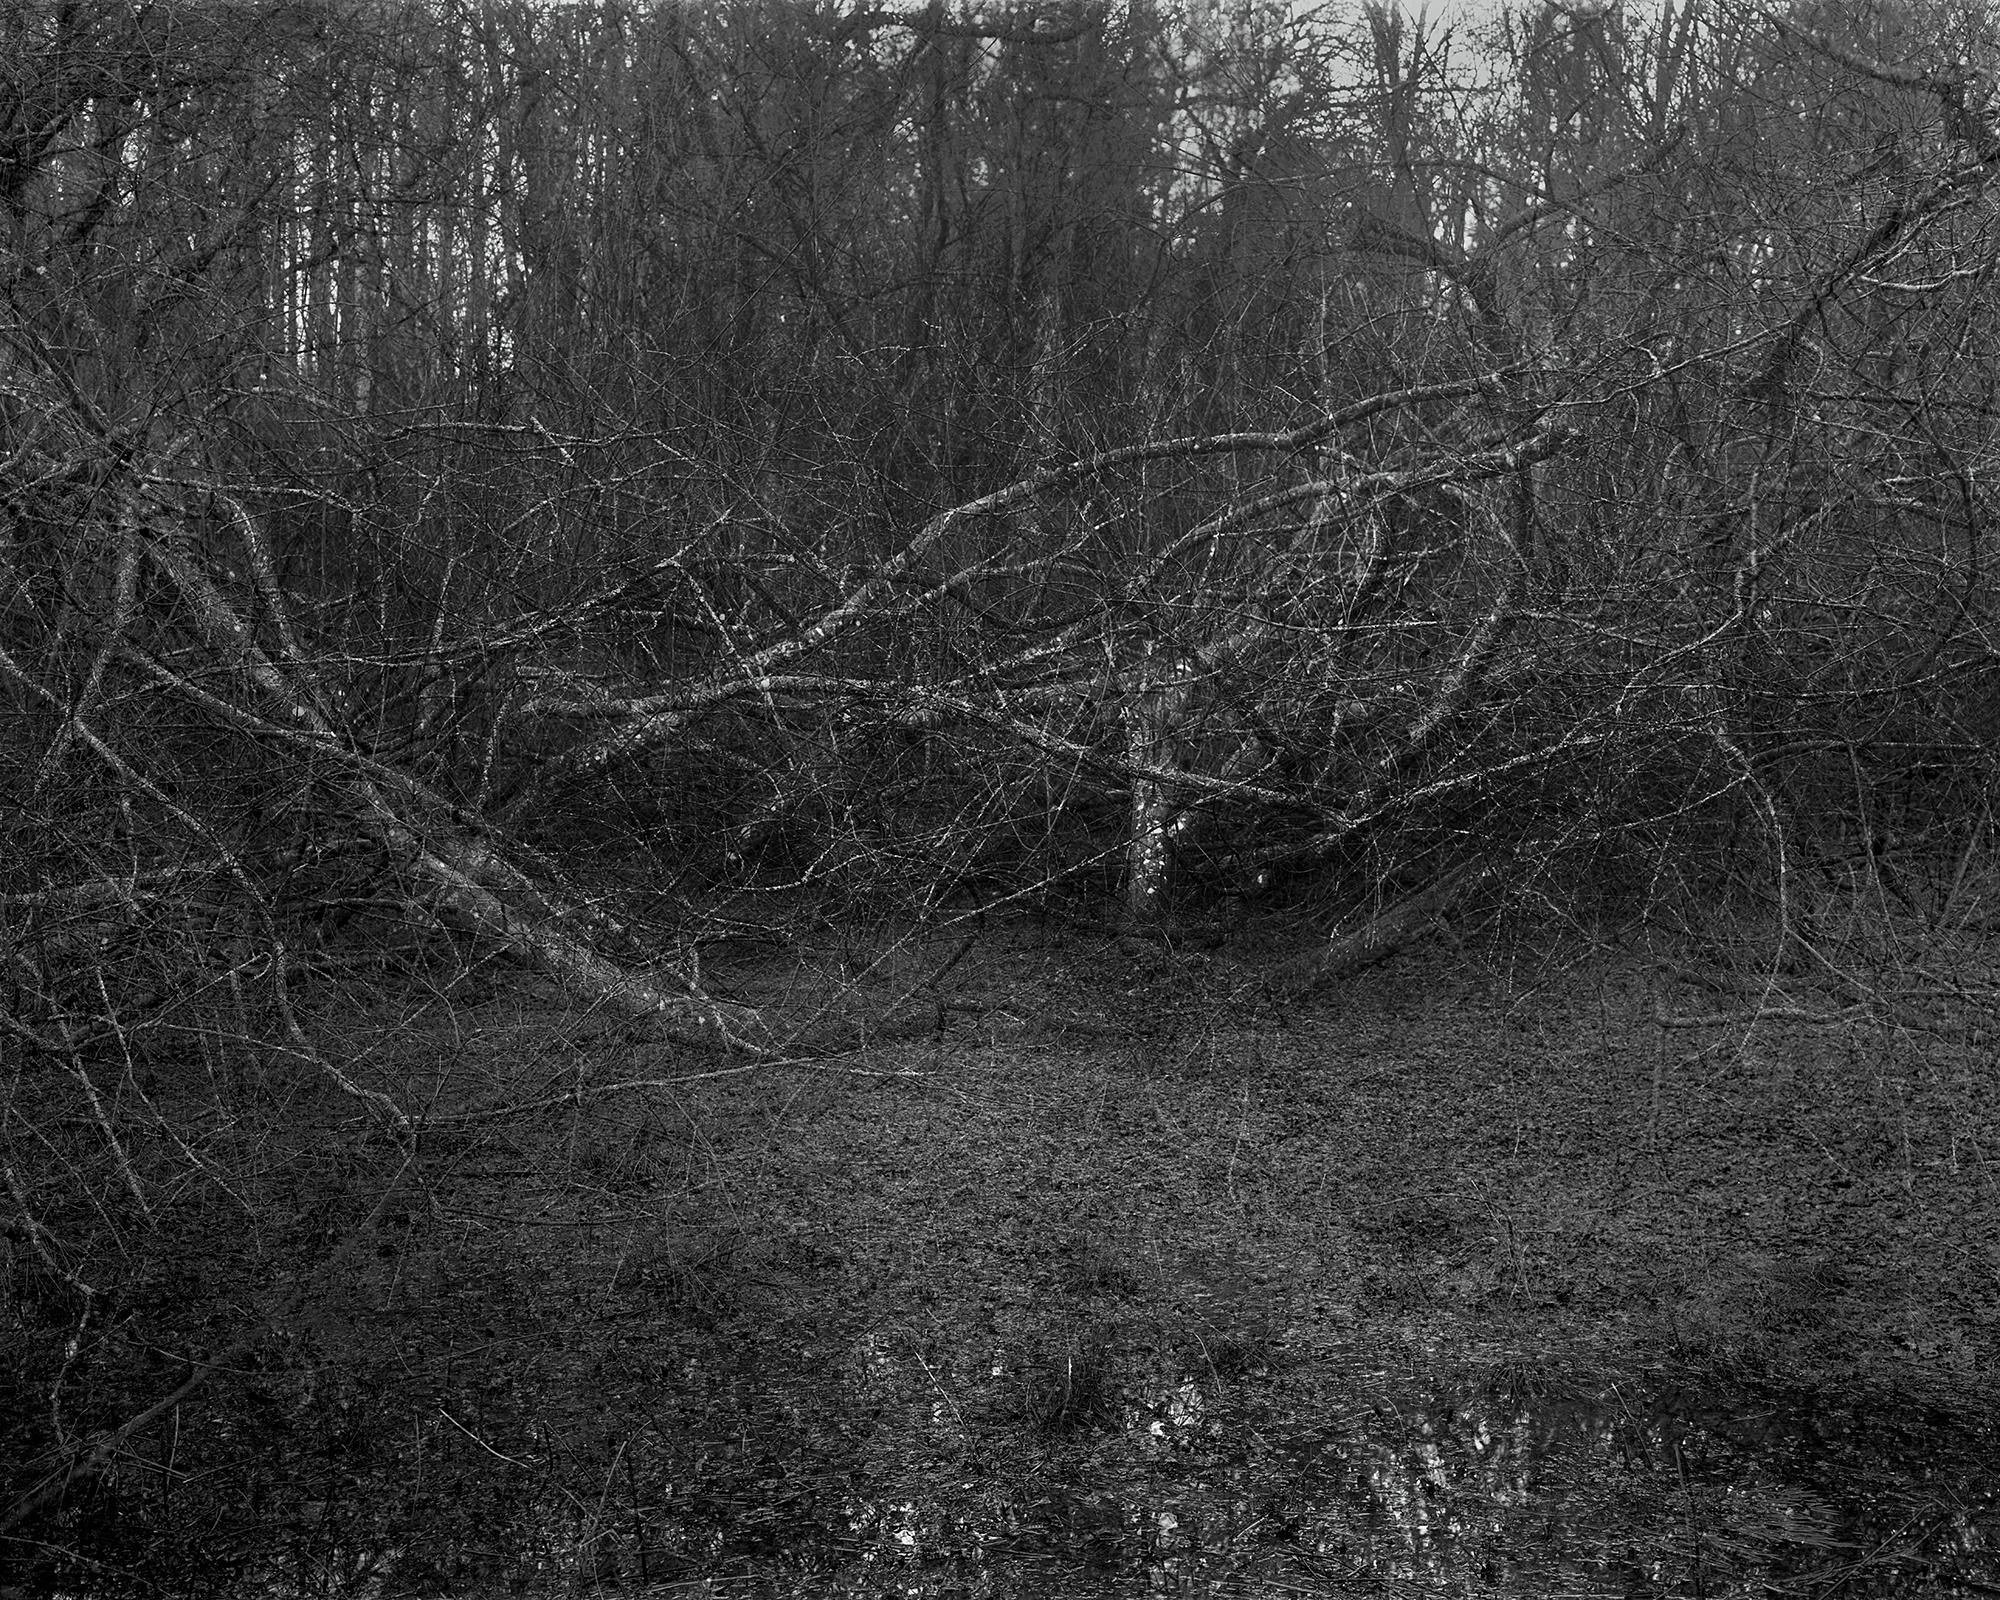 Photograph: Jonty Sale, 'SQUALLSMIRE #2' (2014)